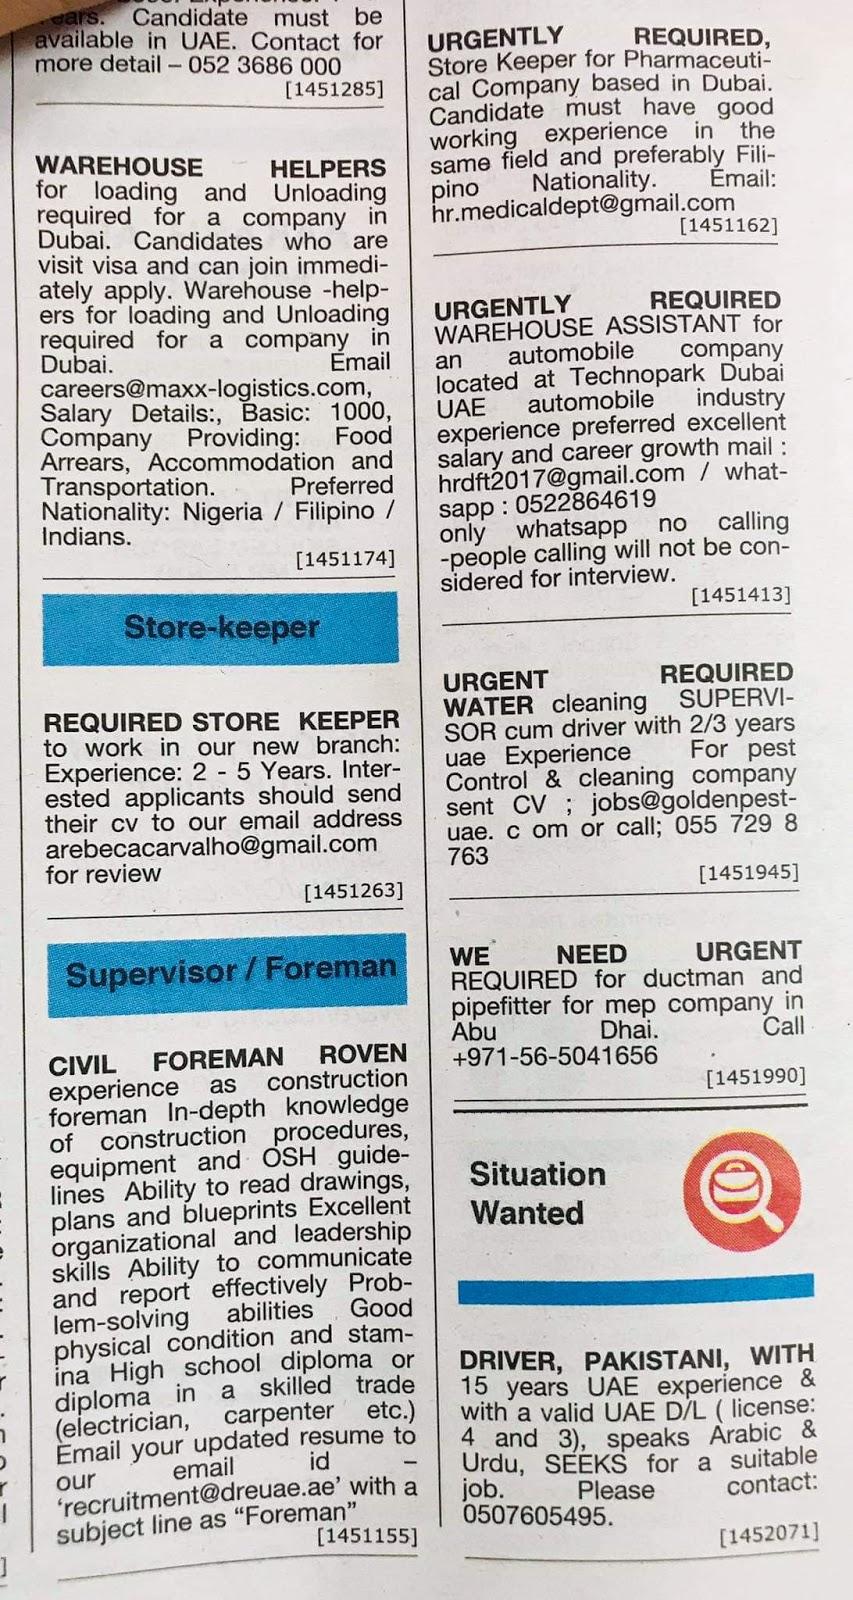 Jobs Vacancies for UAE Local Hiring Jobs Khaleej Times-UAE